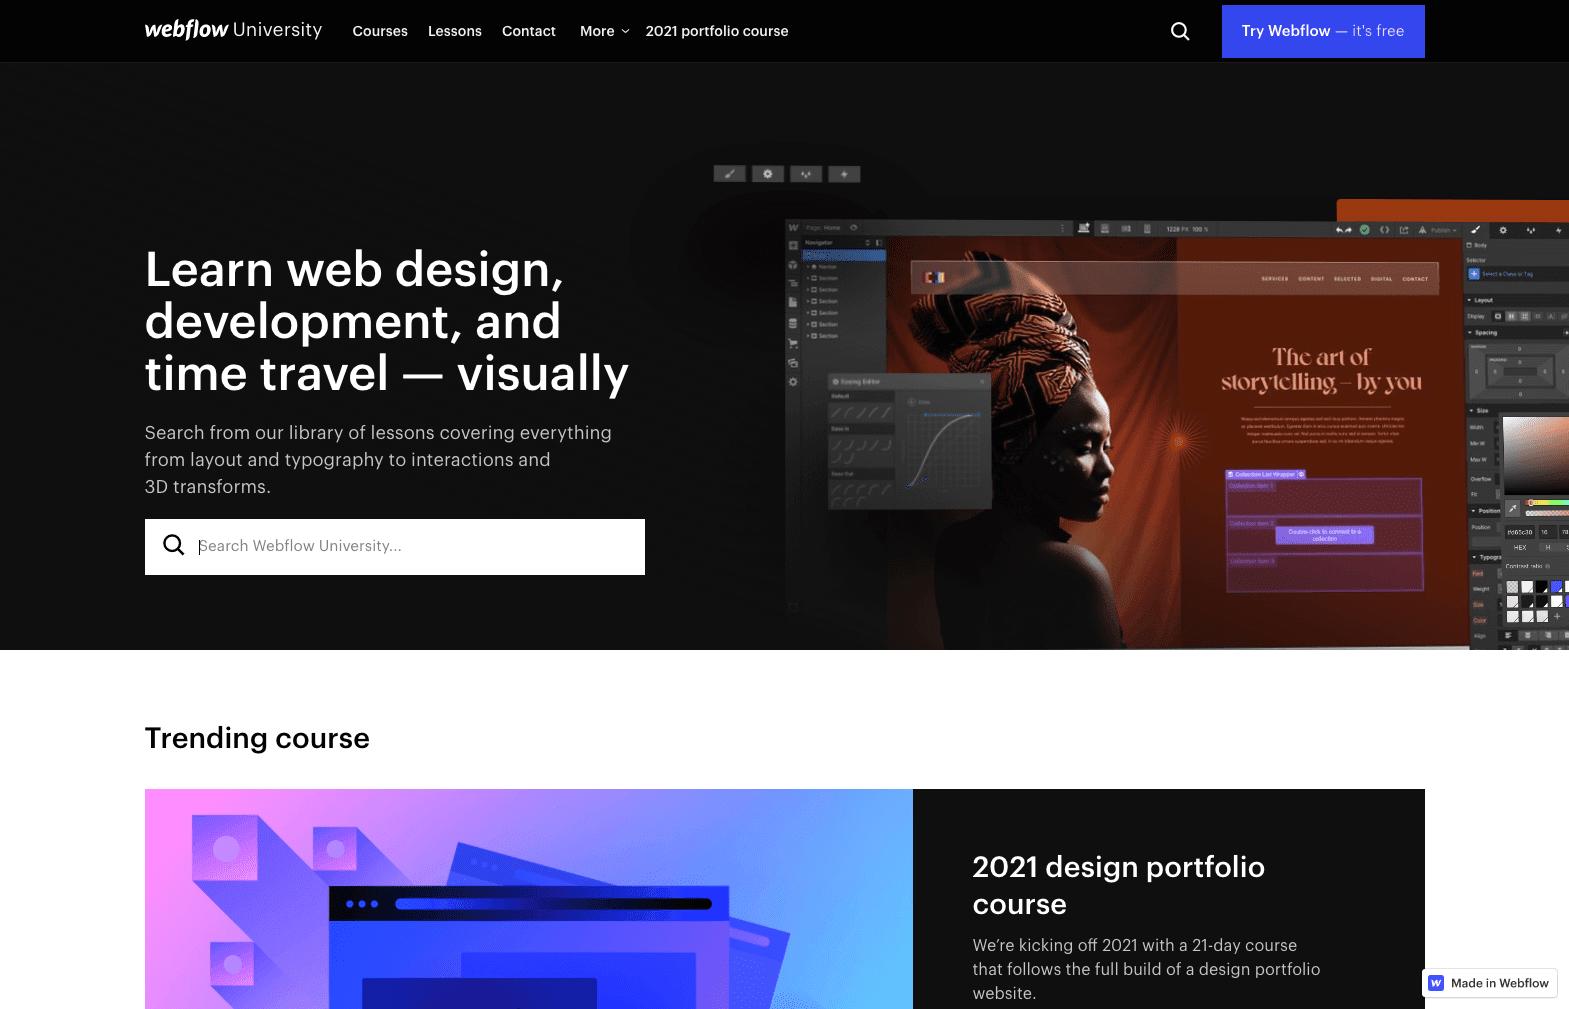 Webflow University offers free training on web design and Webflow development.